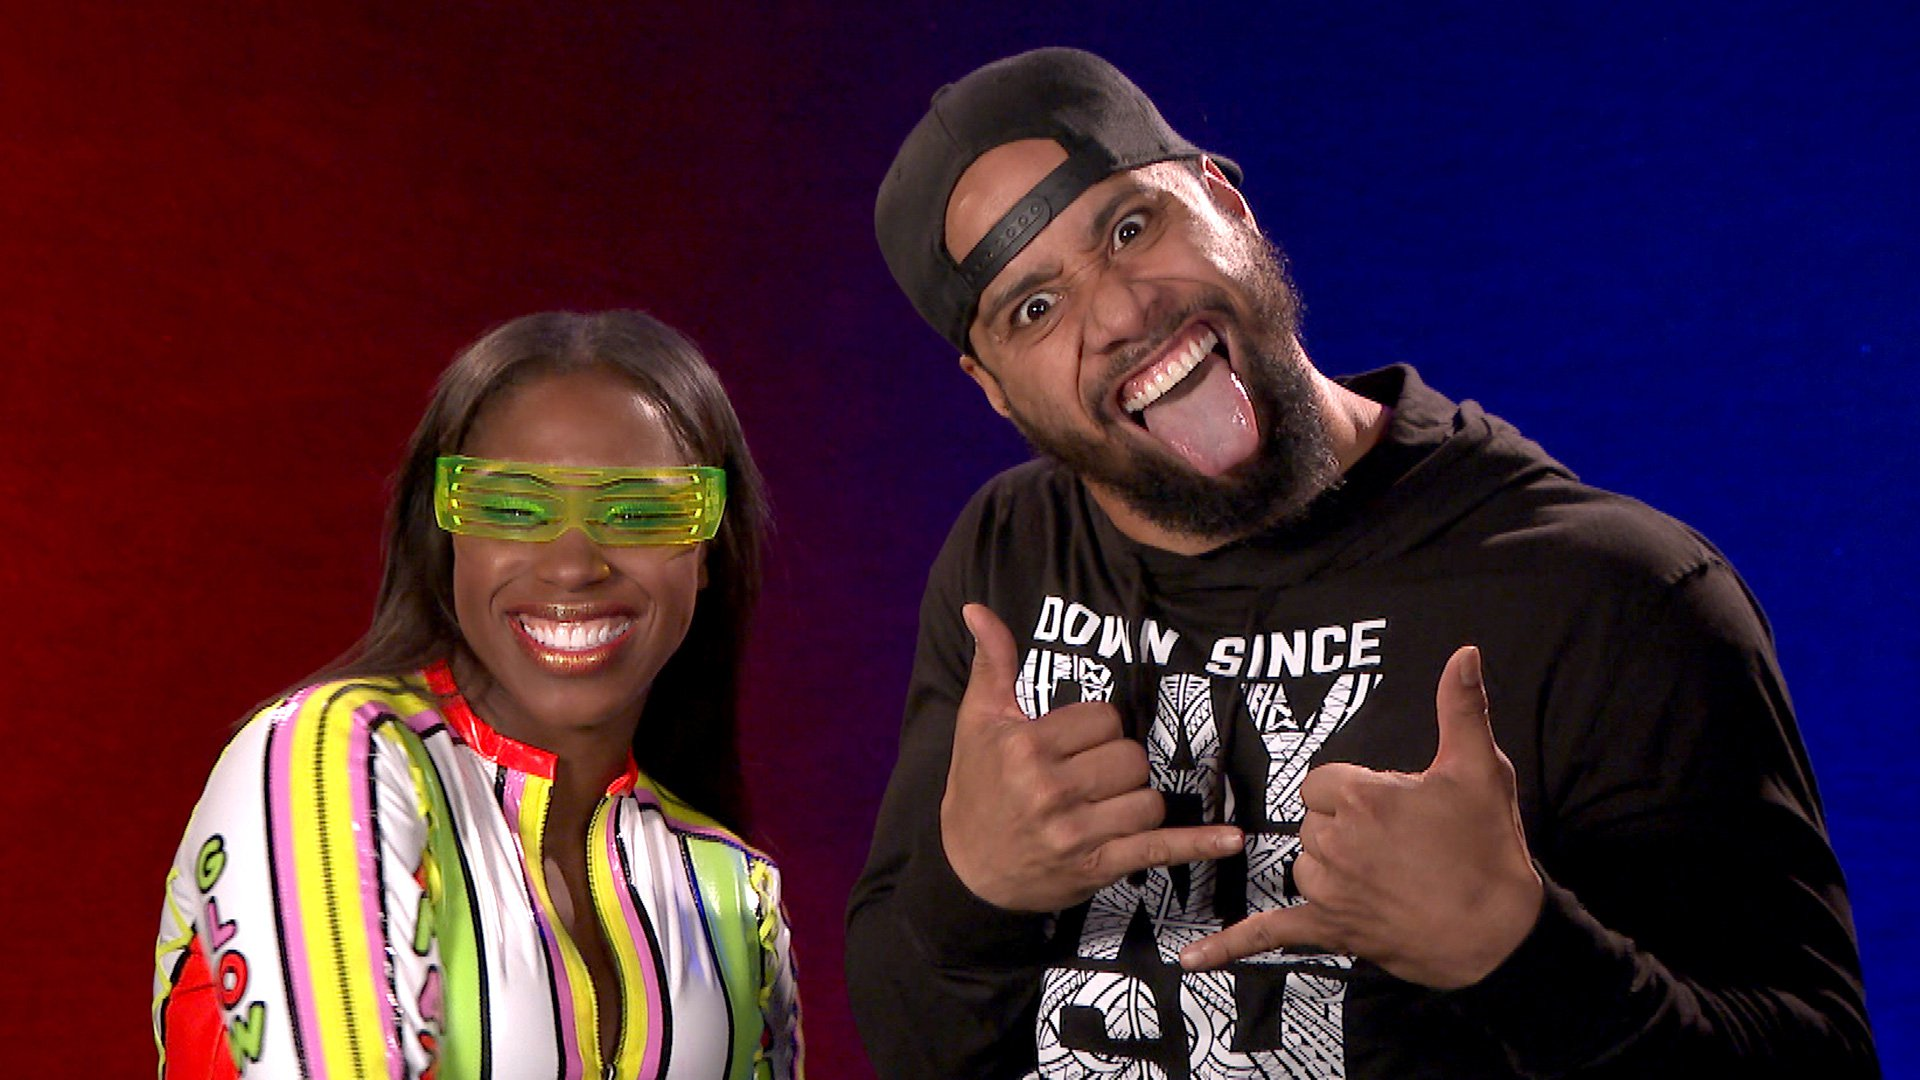 Jimmy Uso & Naomi fiers de représenter Boys & Girls Clubs of America au WWE Mixed Match Challenge